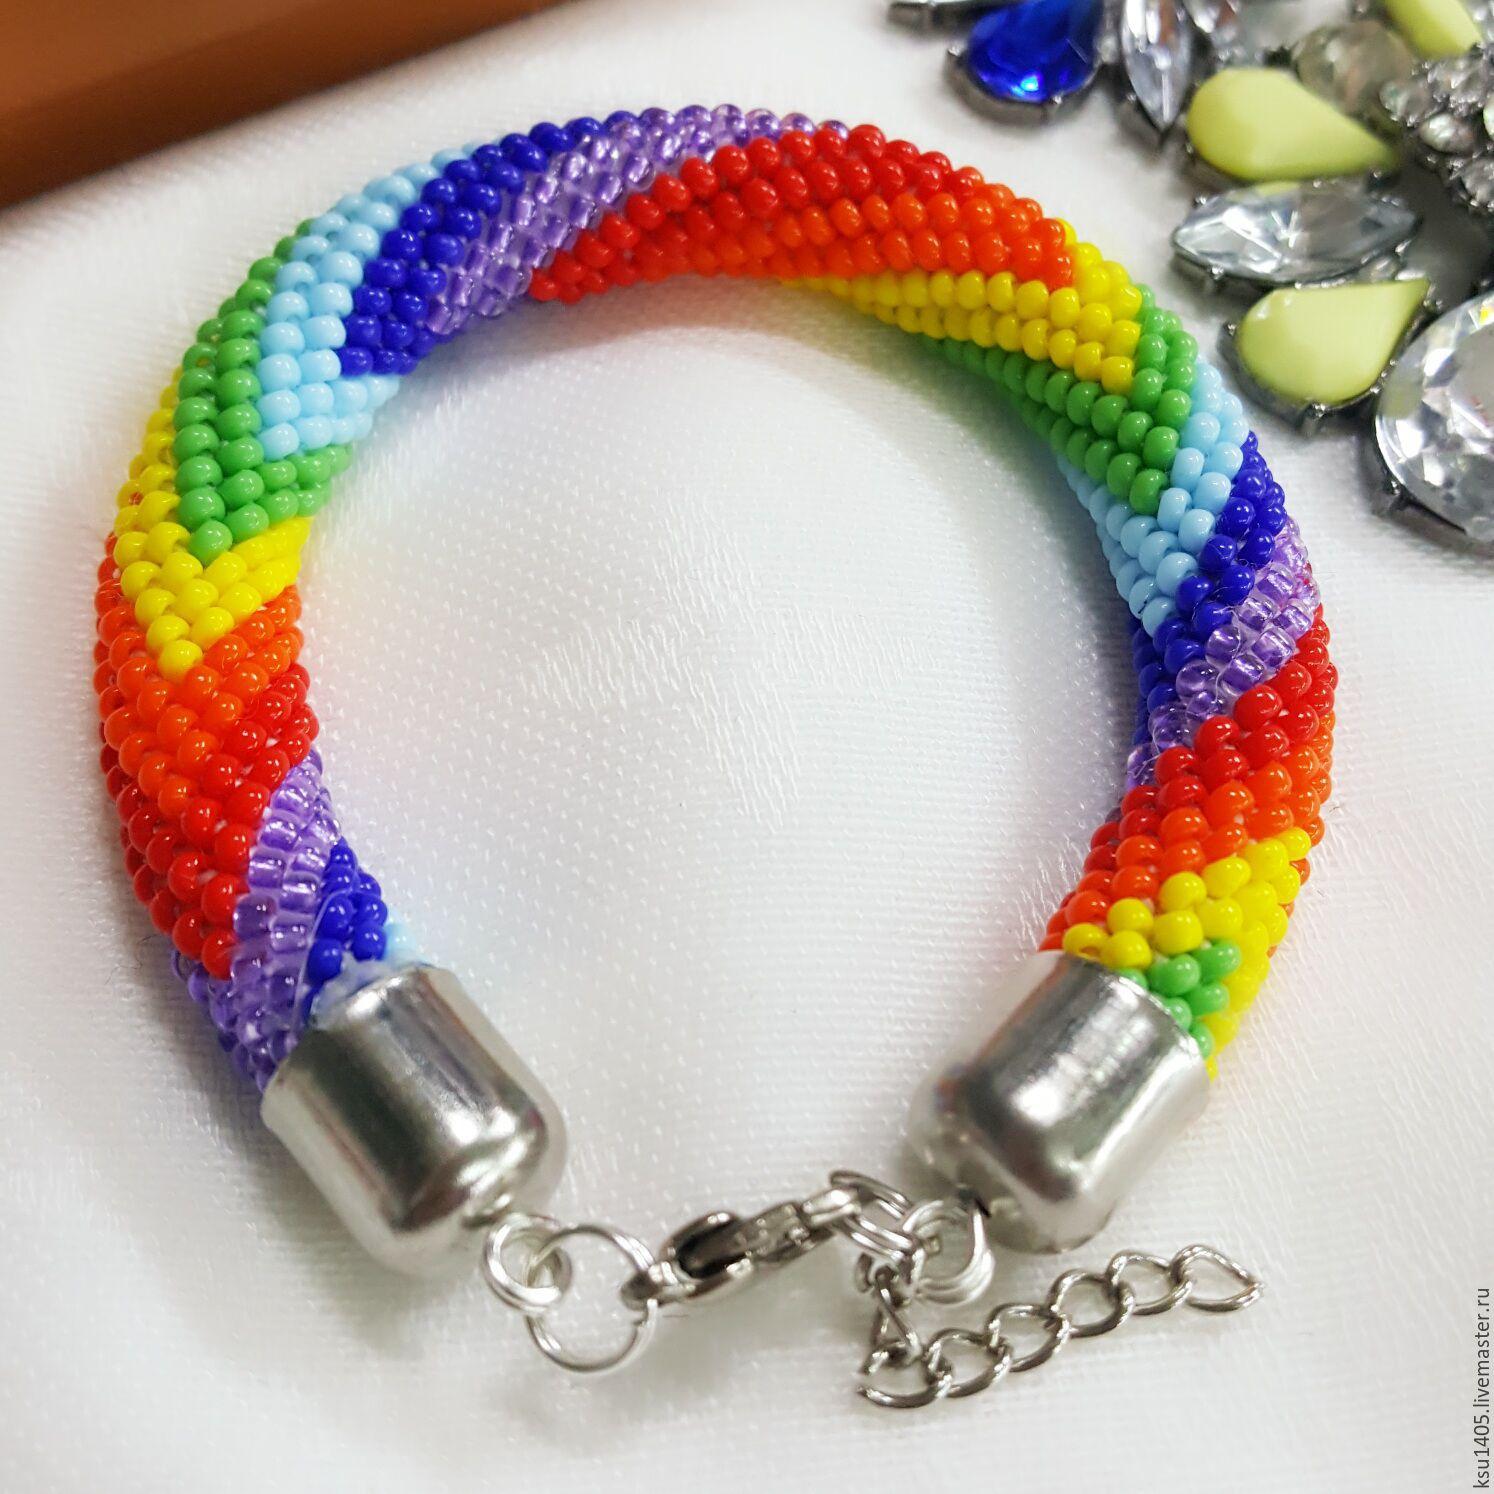 Harness bracelet bead rainbow, Bead bracelet, St. Petersburg,  Фото №1